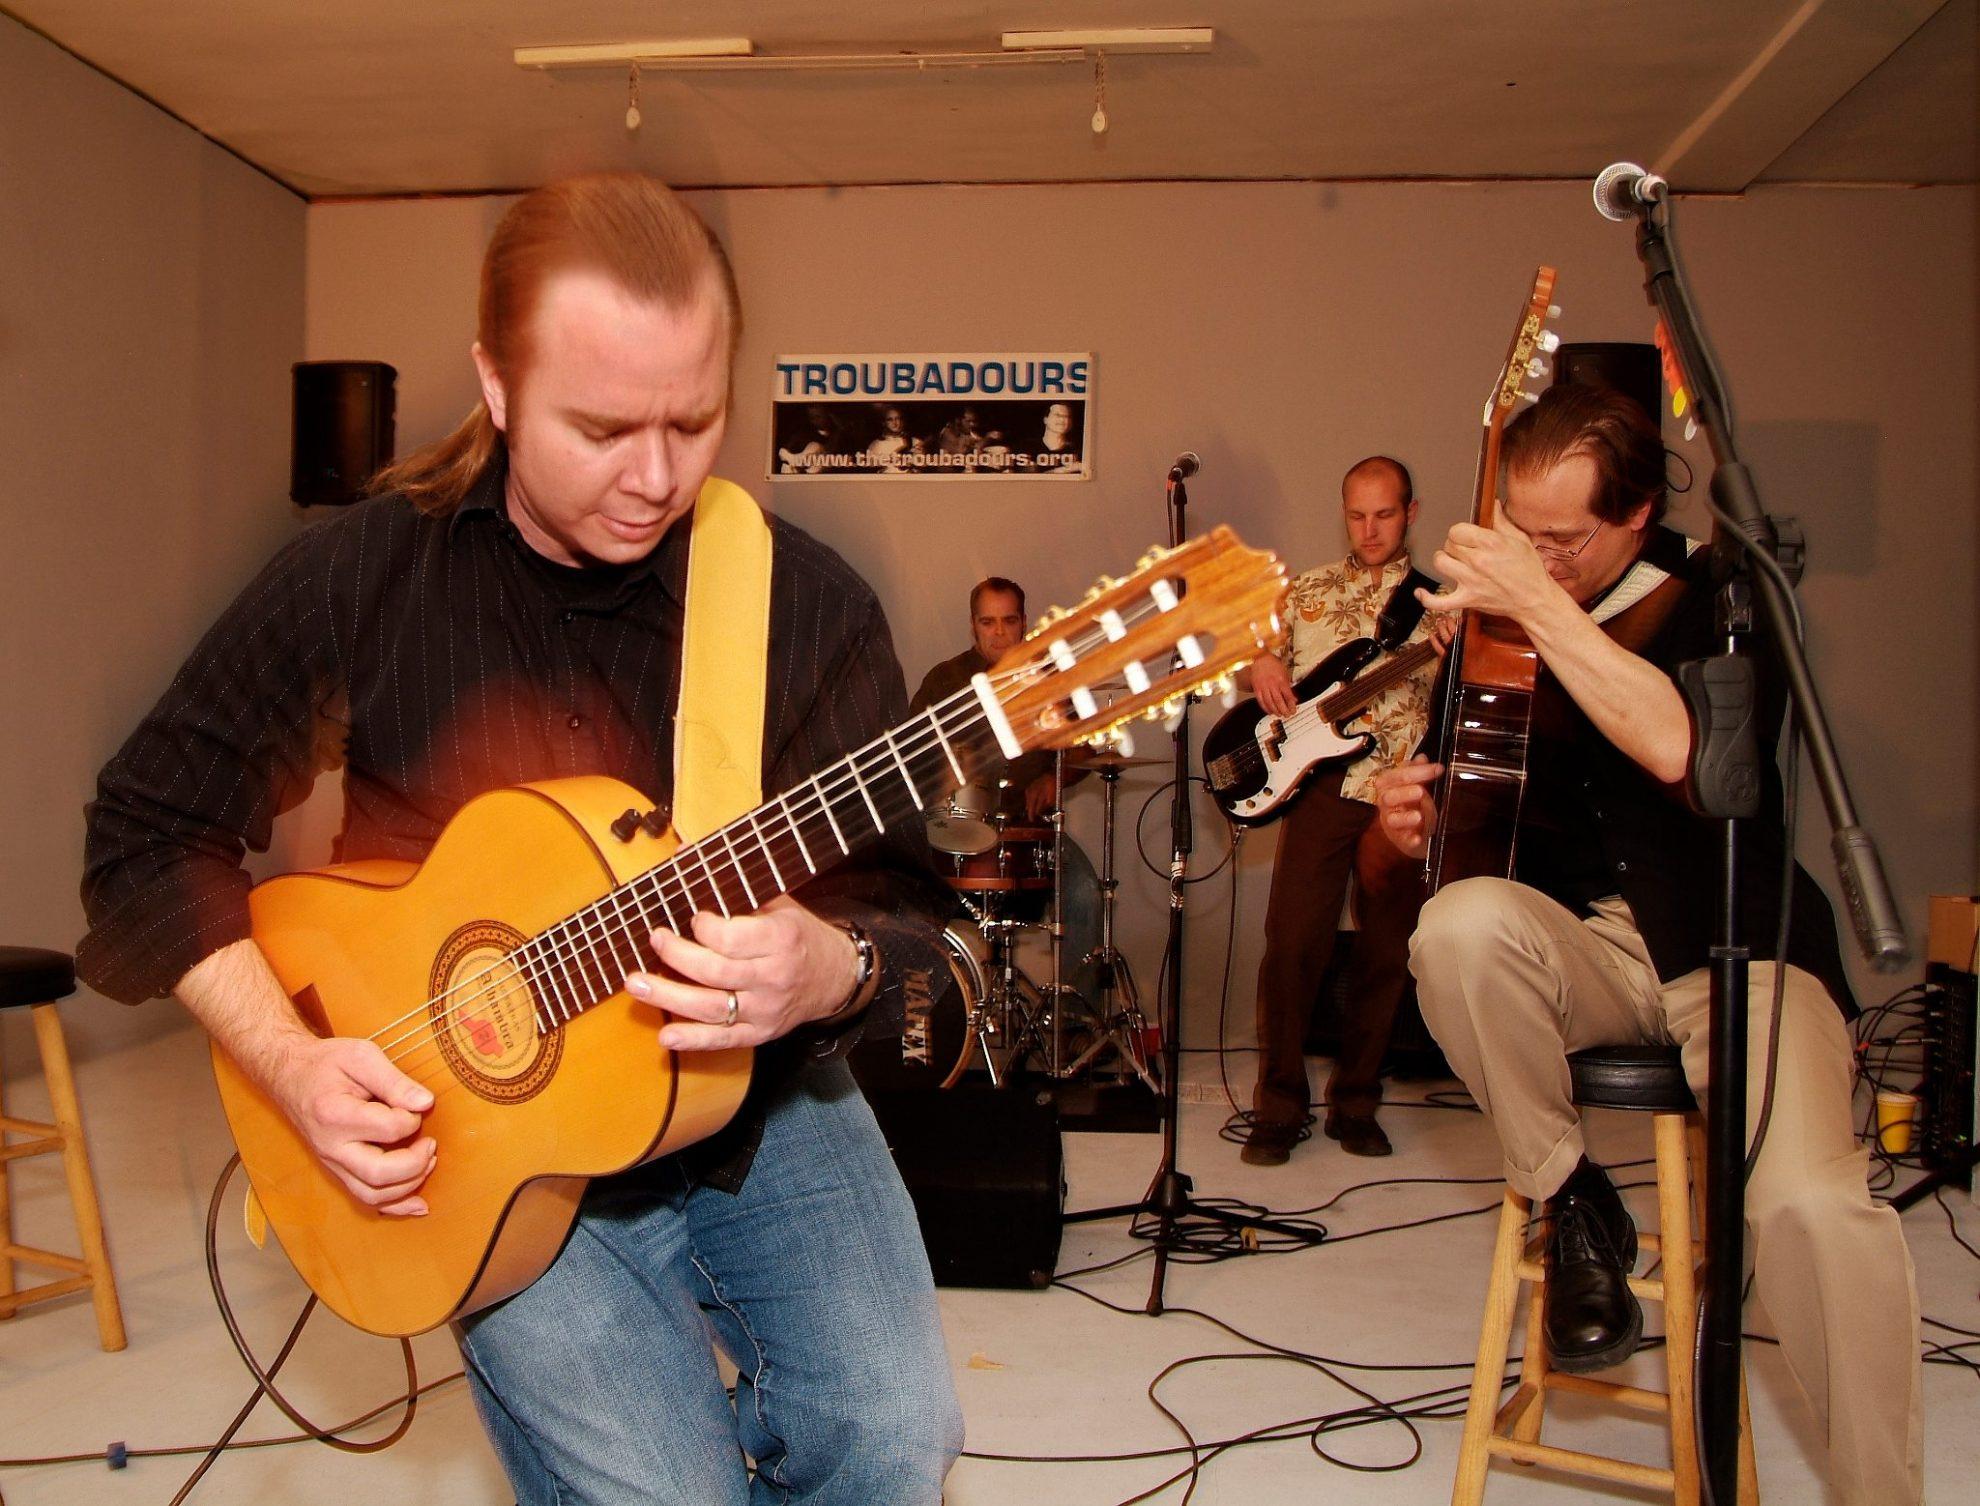 OctanePhotographicStudioTroubadours2